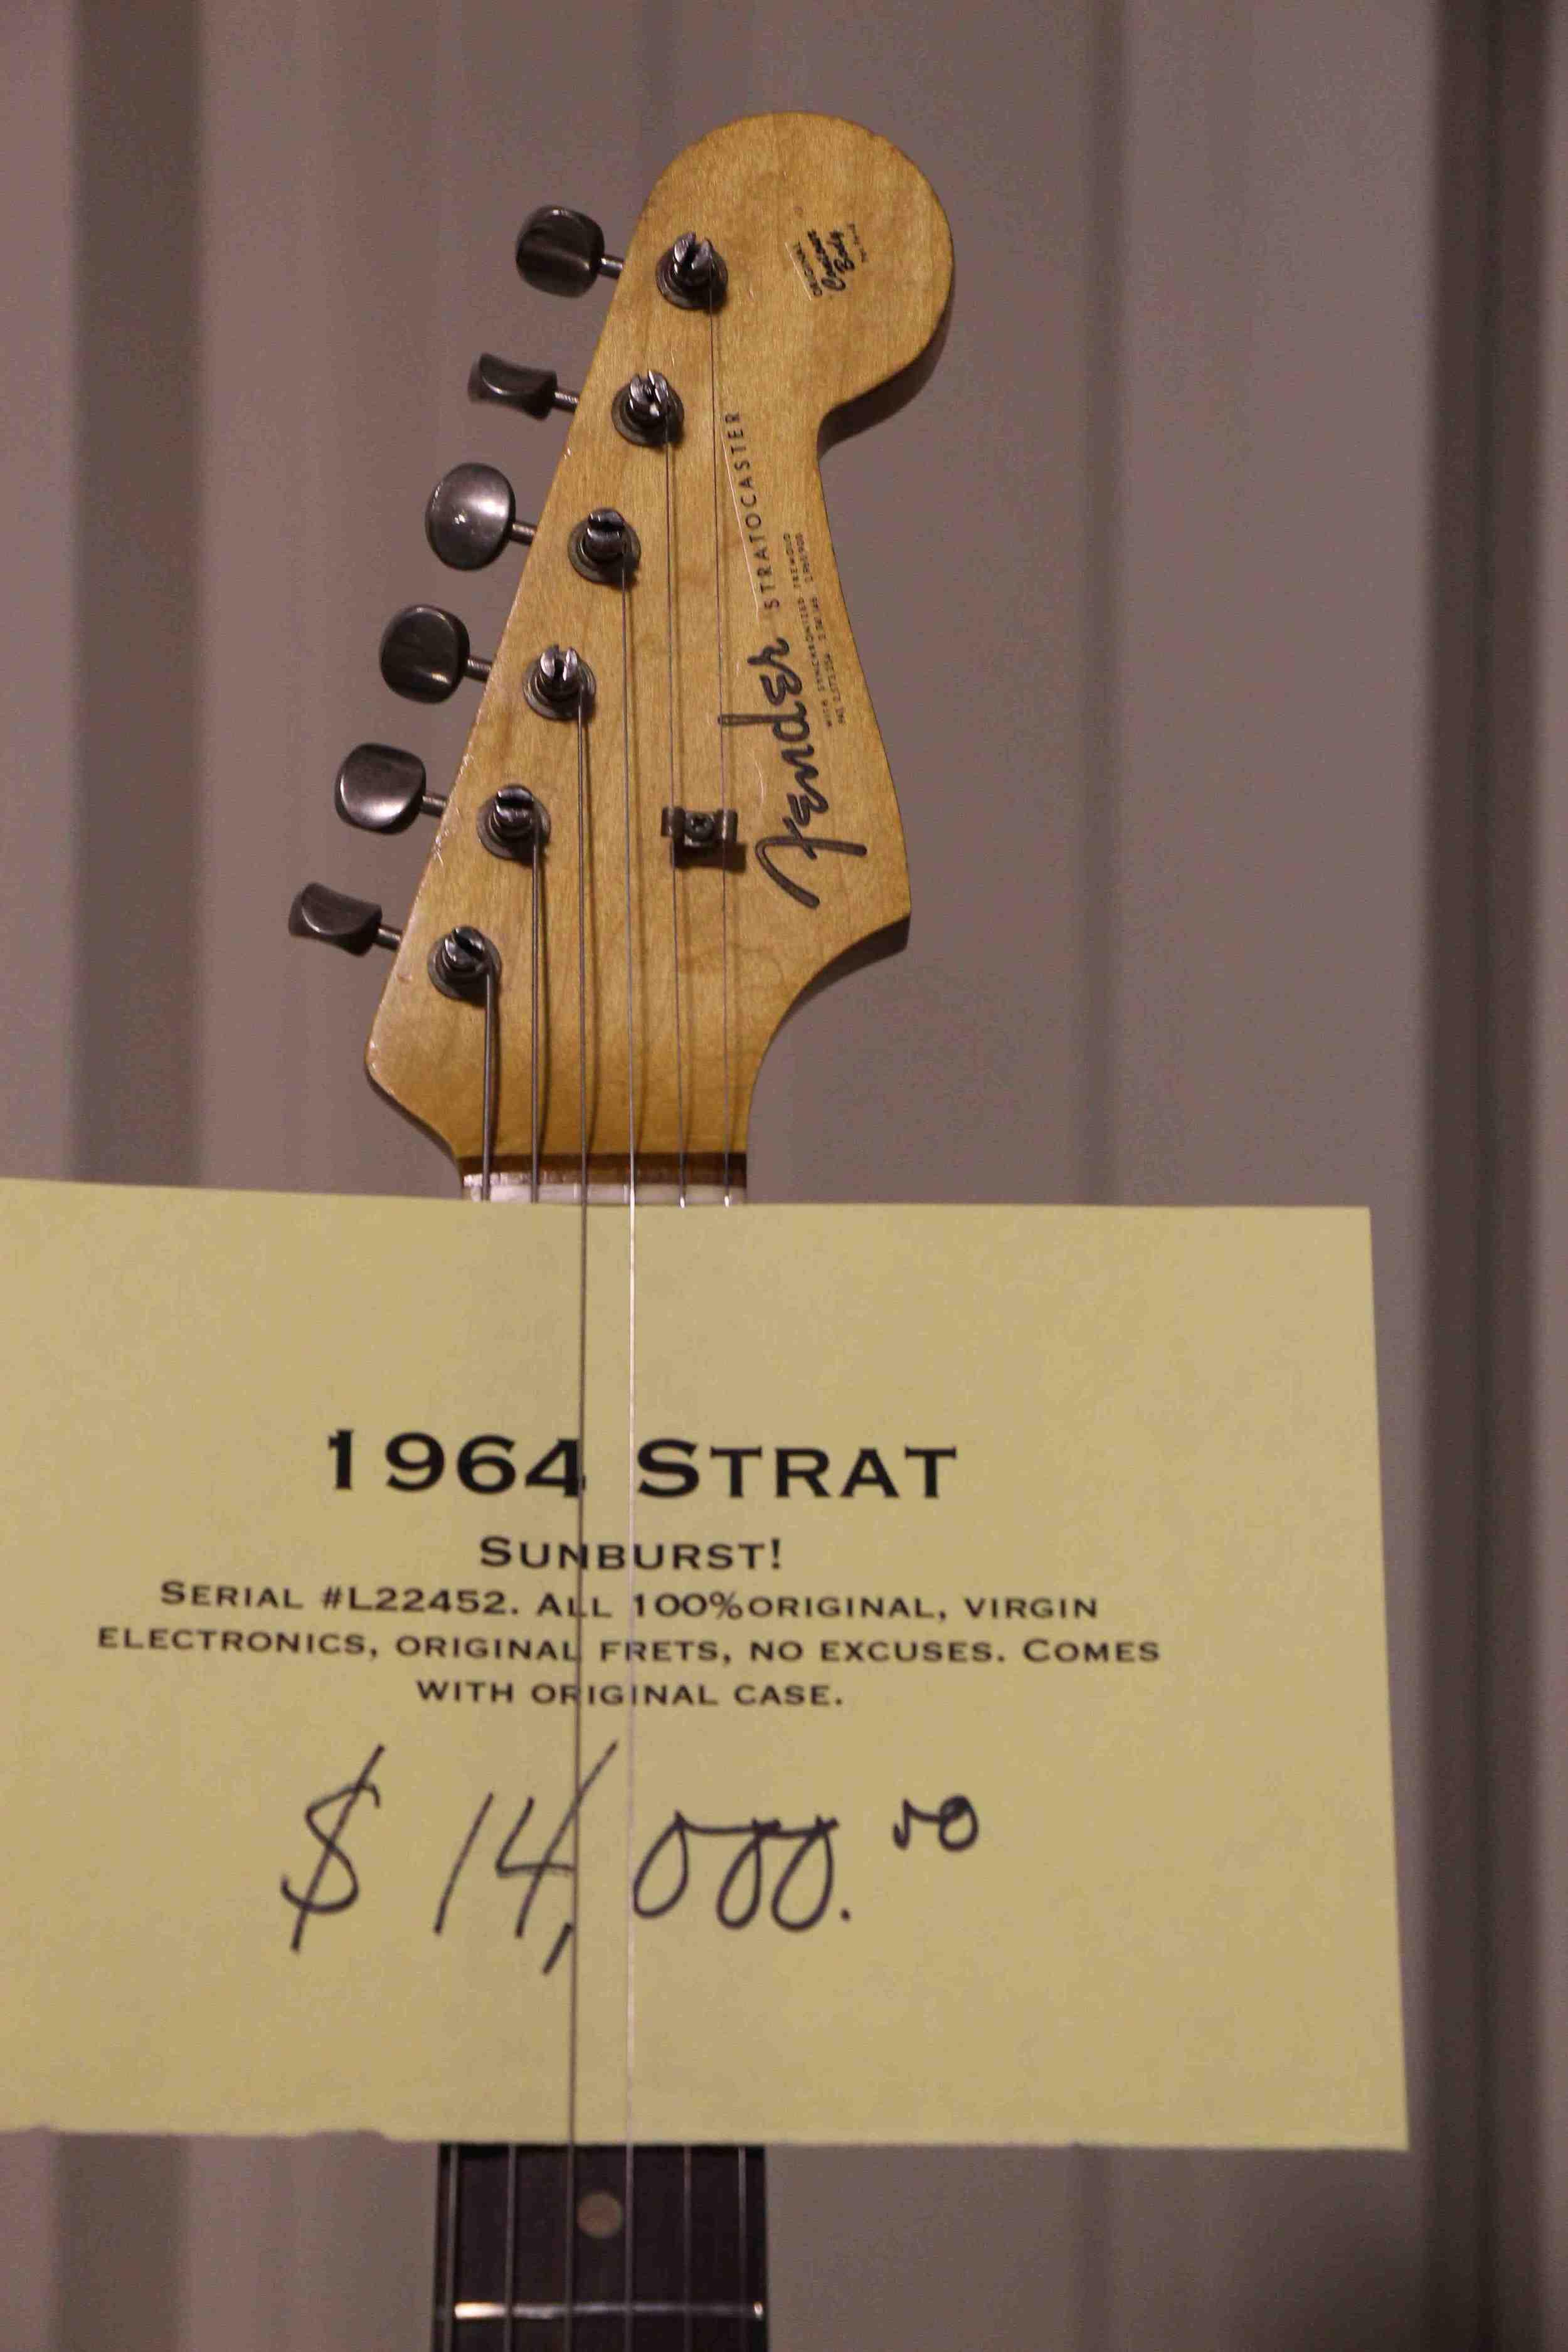 1964 fender stratocaster price tag.jpg